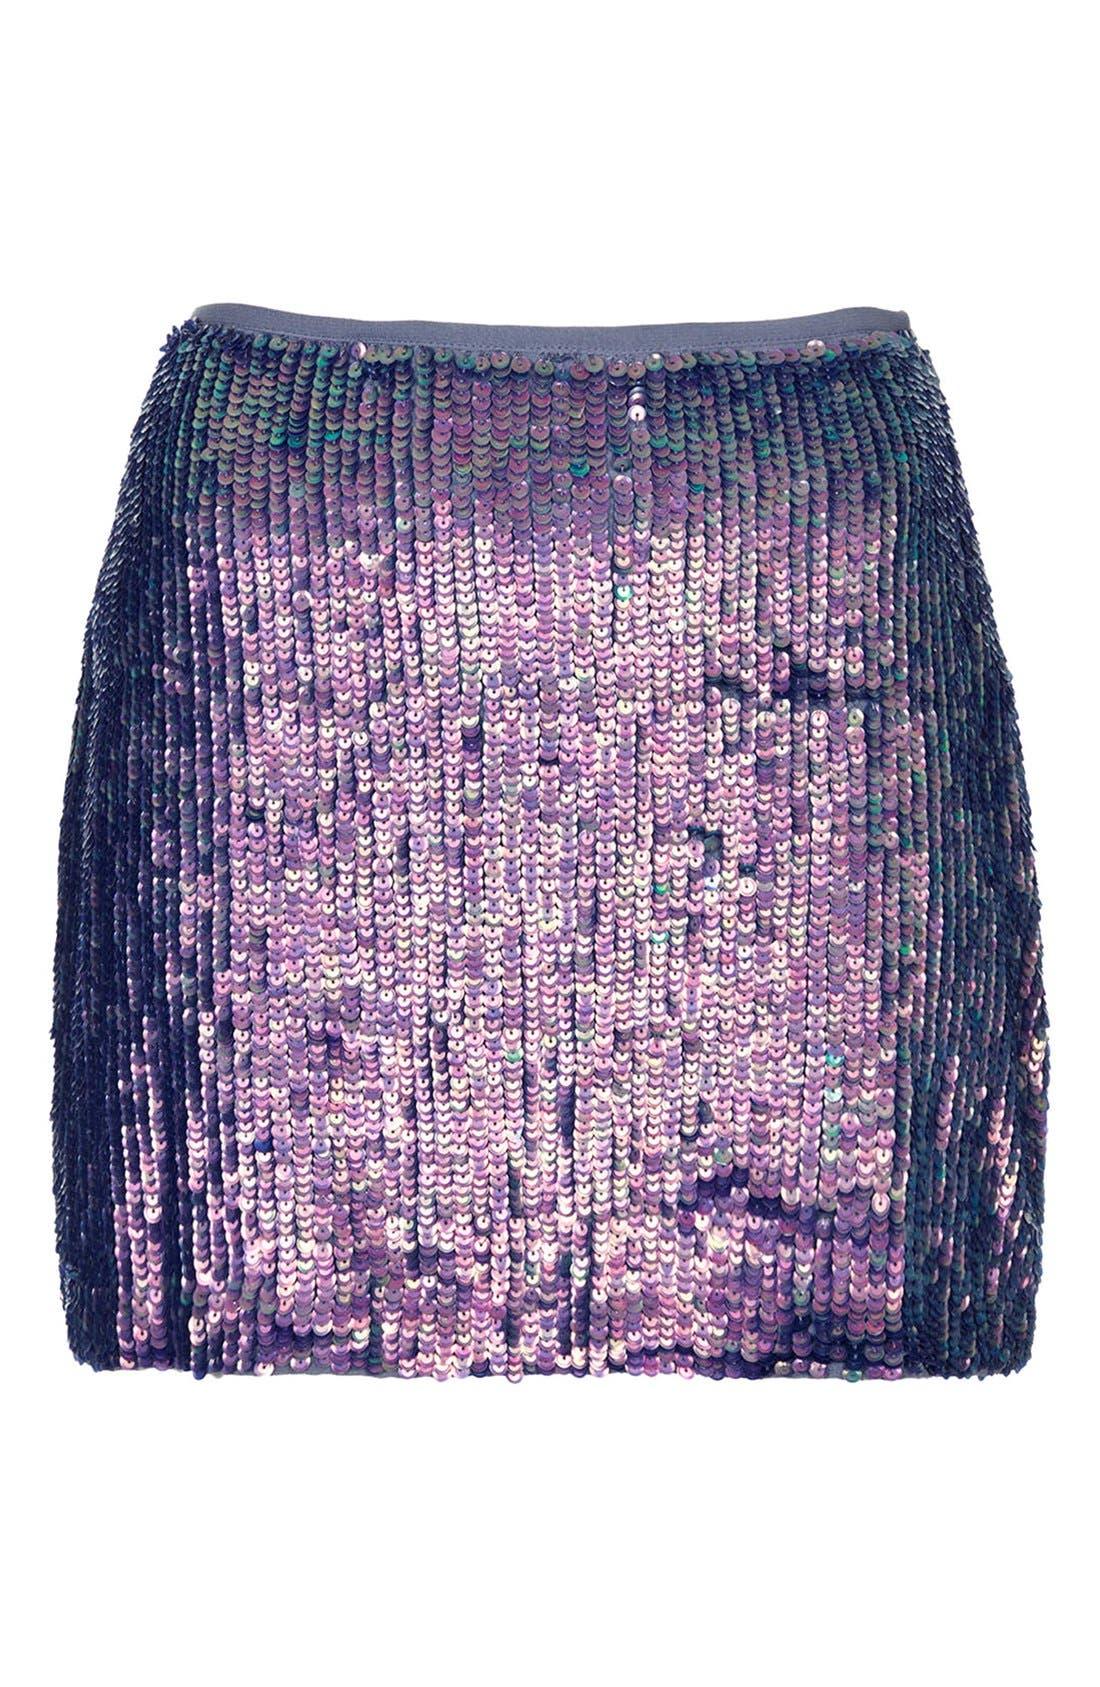 Alternate Image 3  - Topshop Sequin Miniskirt